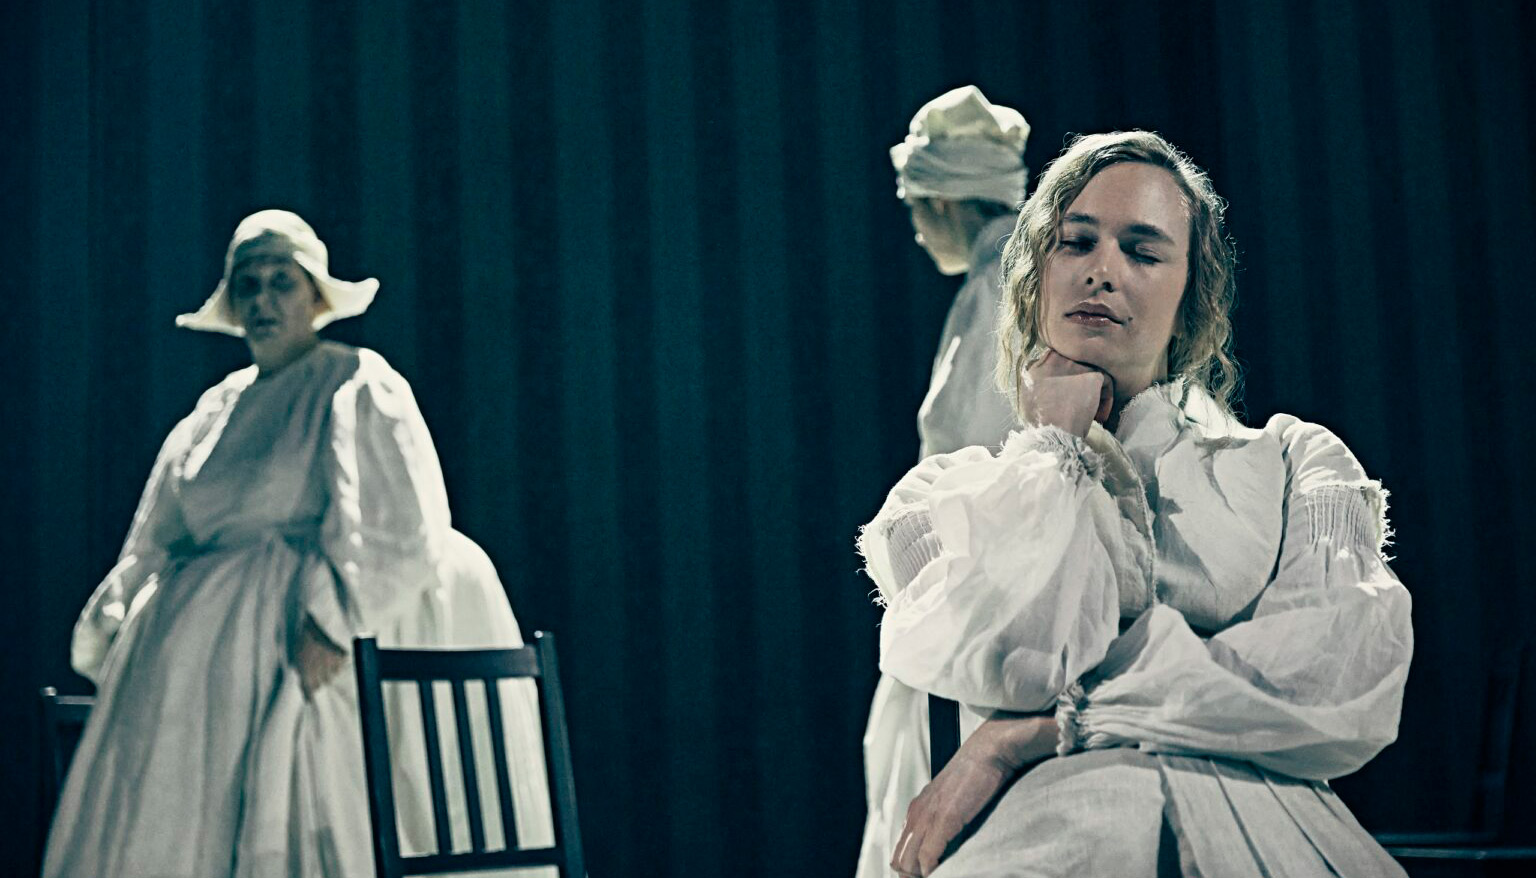 Publikum bestemmer handlingen: Aalborg Teater præsenterer interaktiv forestilling